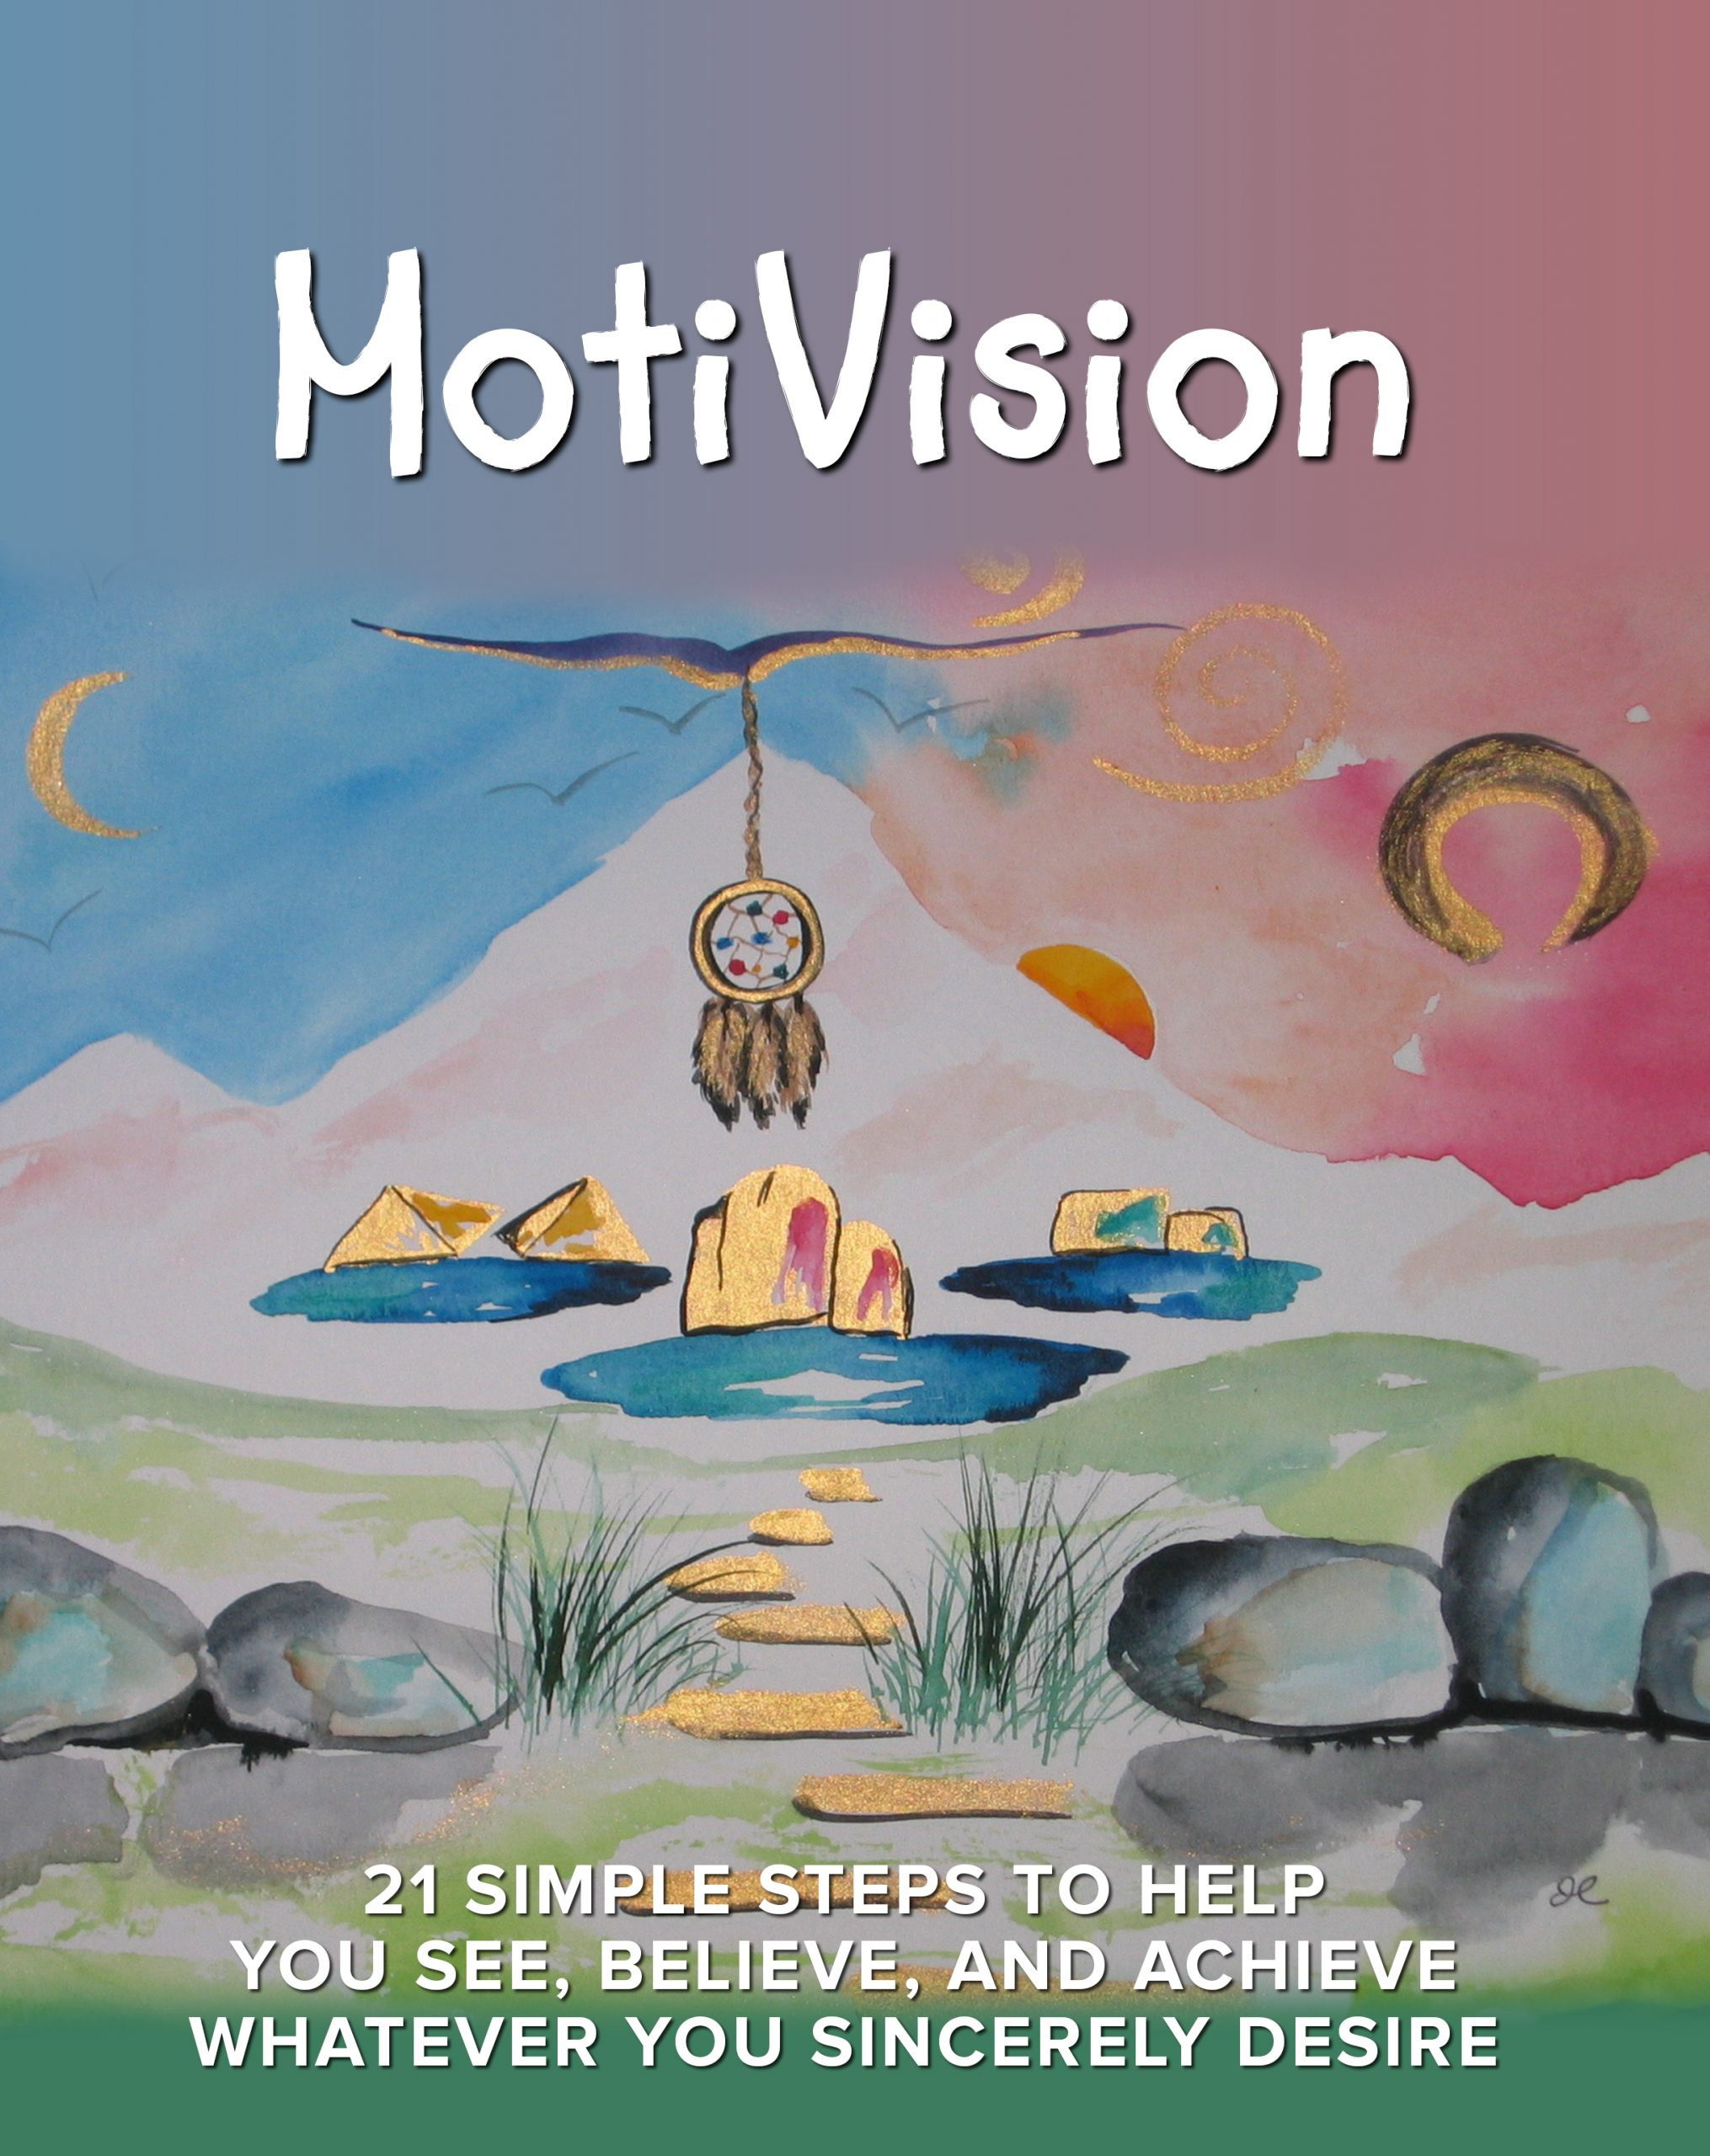 Motivision